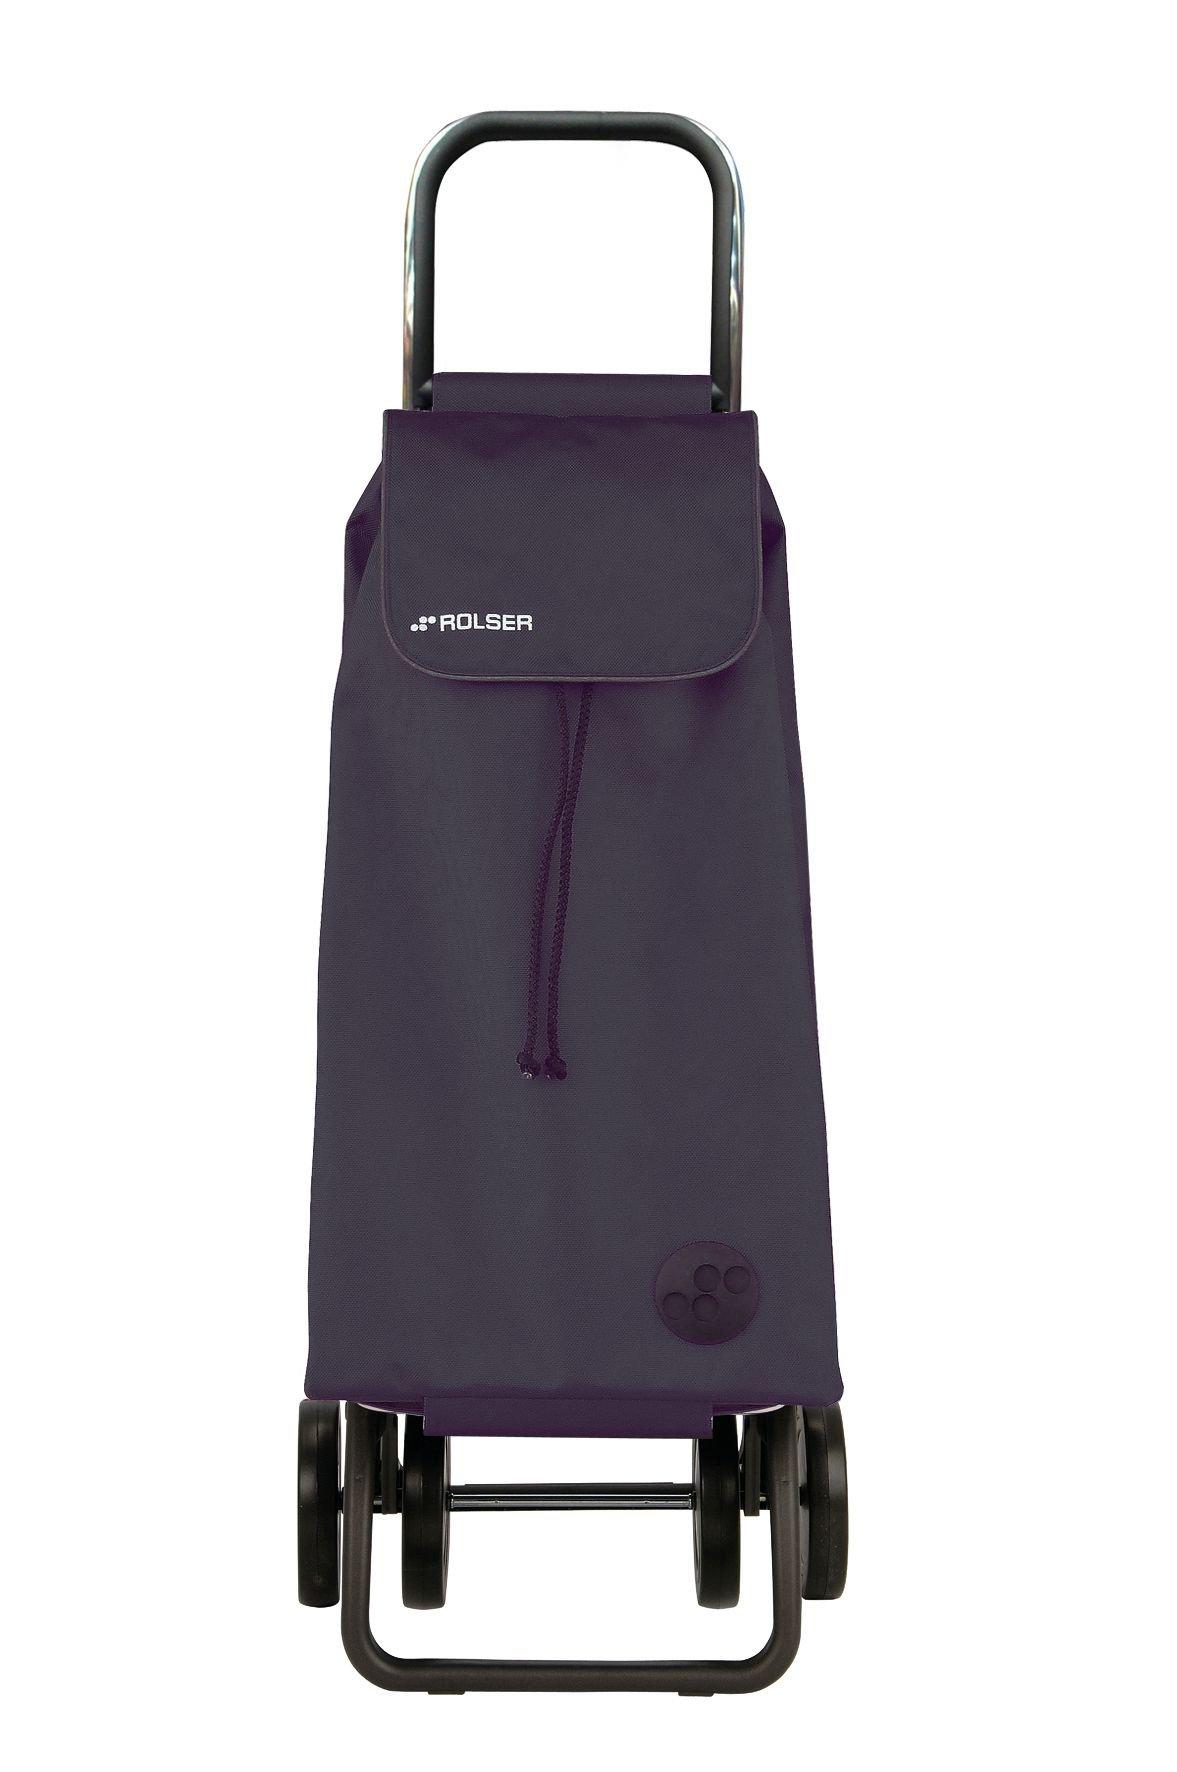 e0f631b99ac9 Rolser Pack Folding Shopping Trolley 4 Wheel - Blue/Grey at Barnitts ...